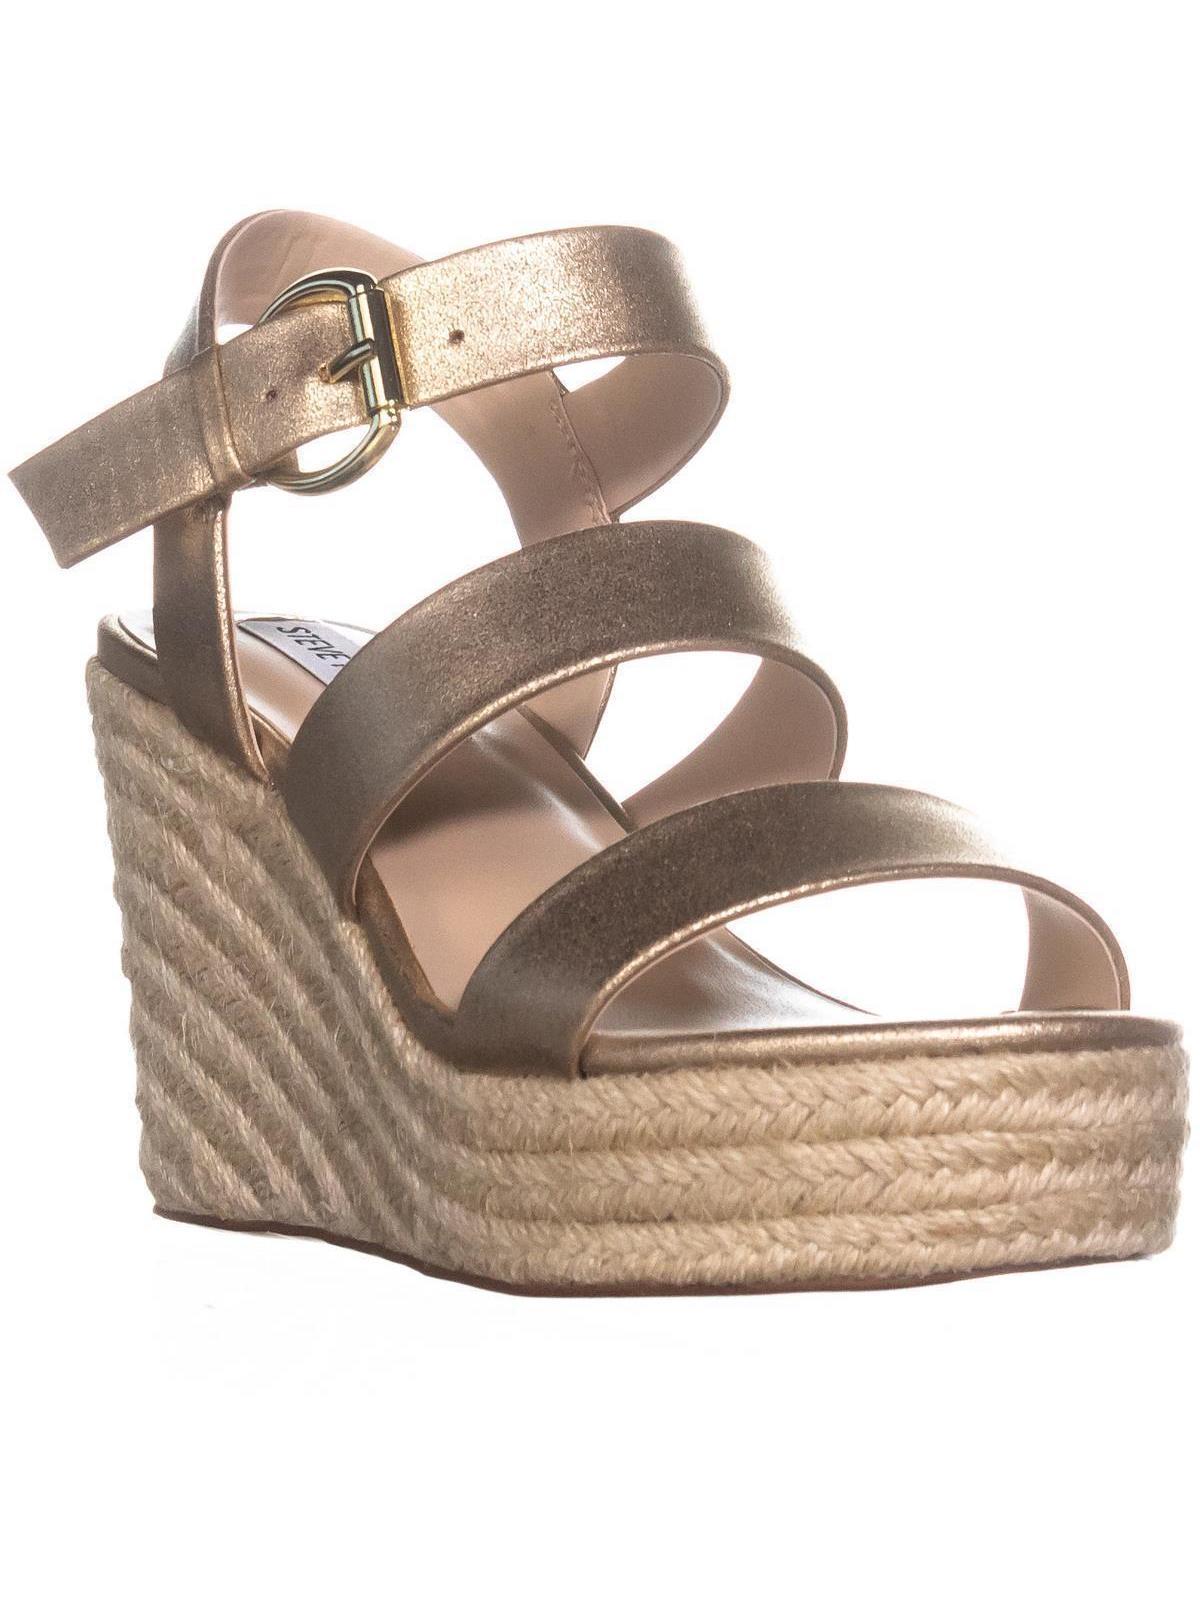 Womens Steve Madden Valery Platform Wedge Sandals, Gold